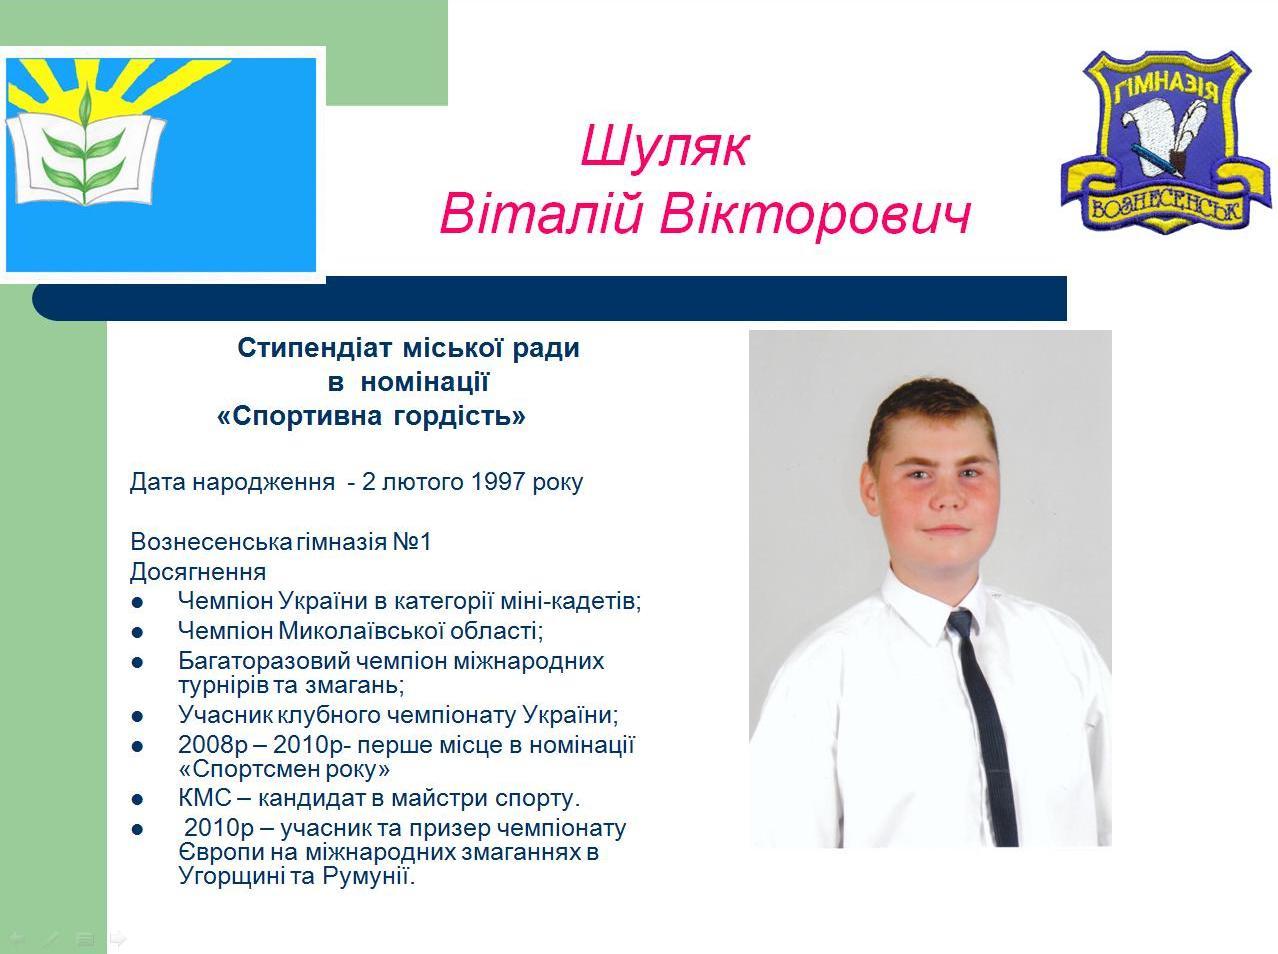 shulyak